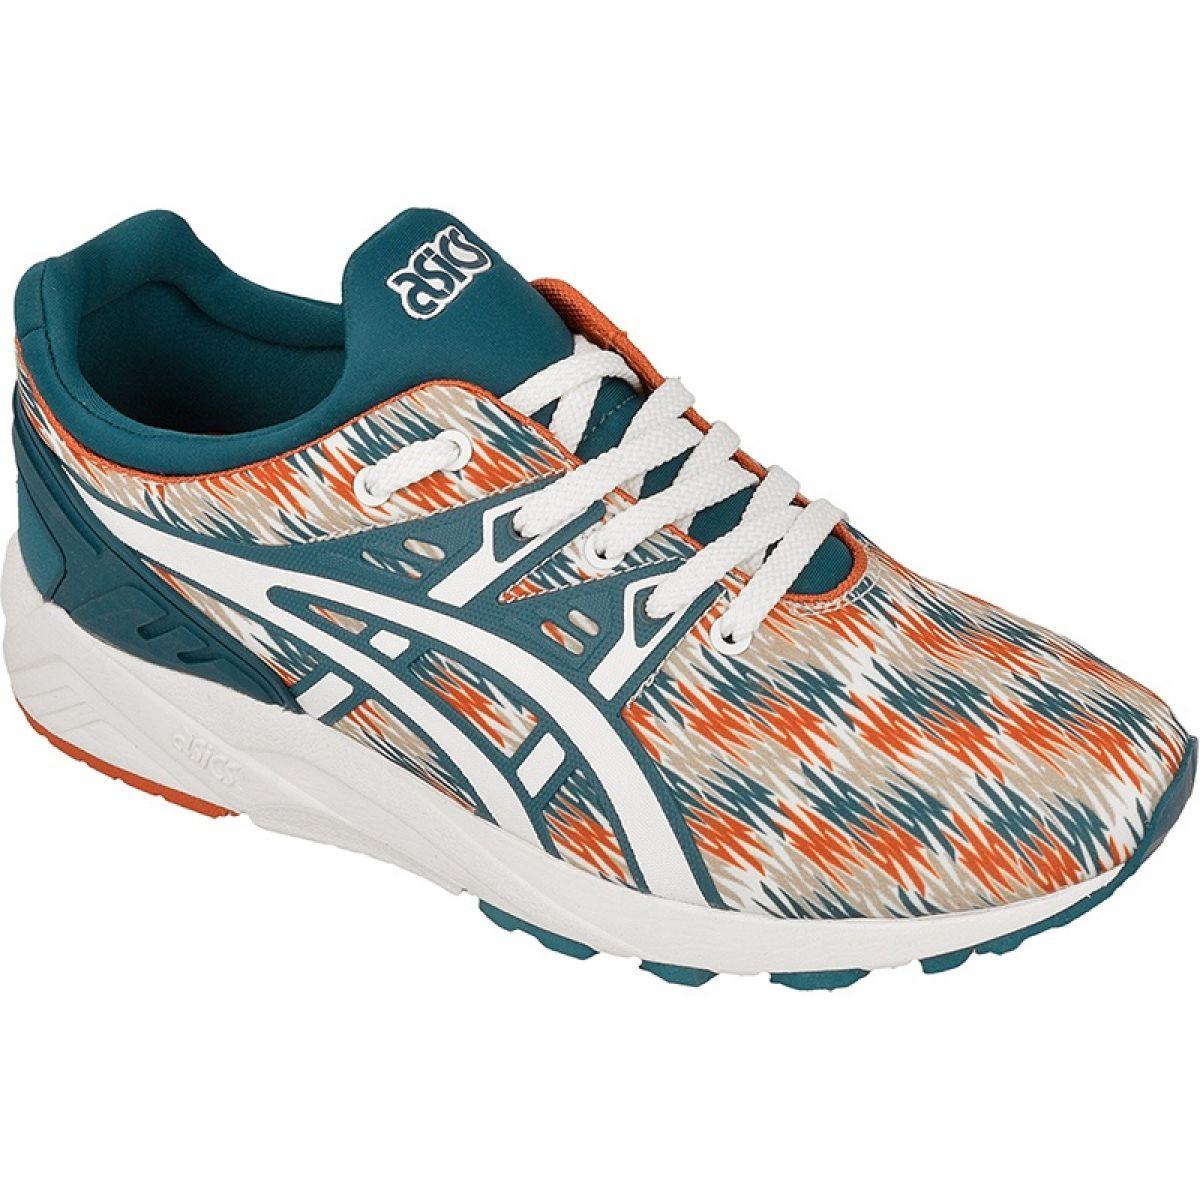 asics multi coloured trainers